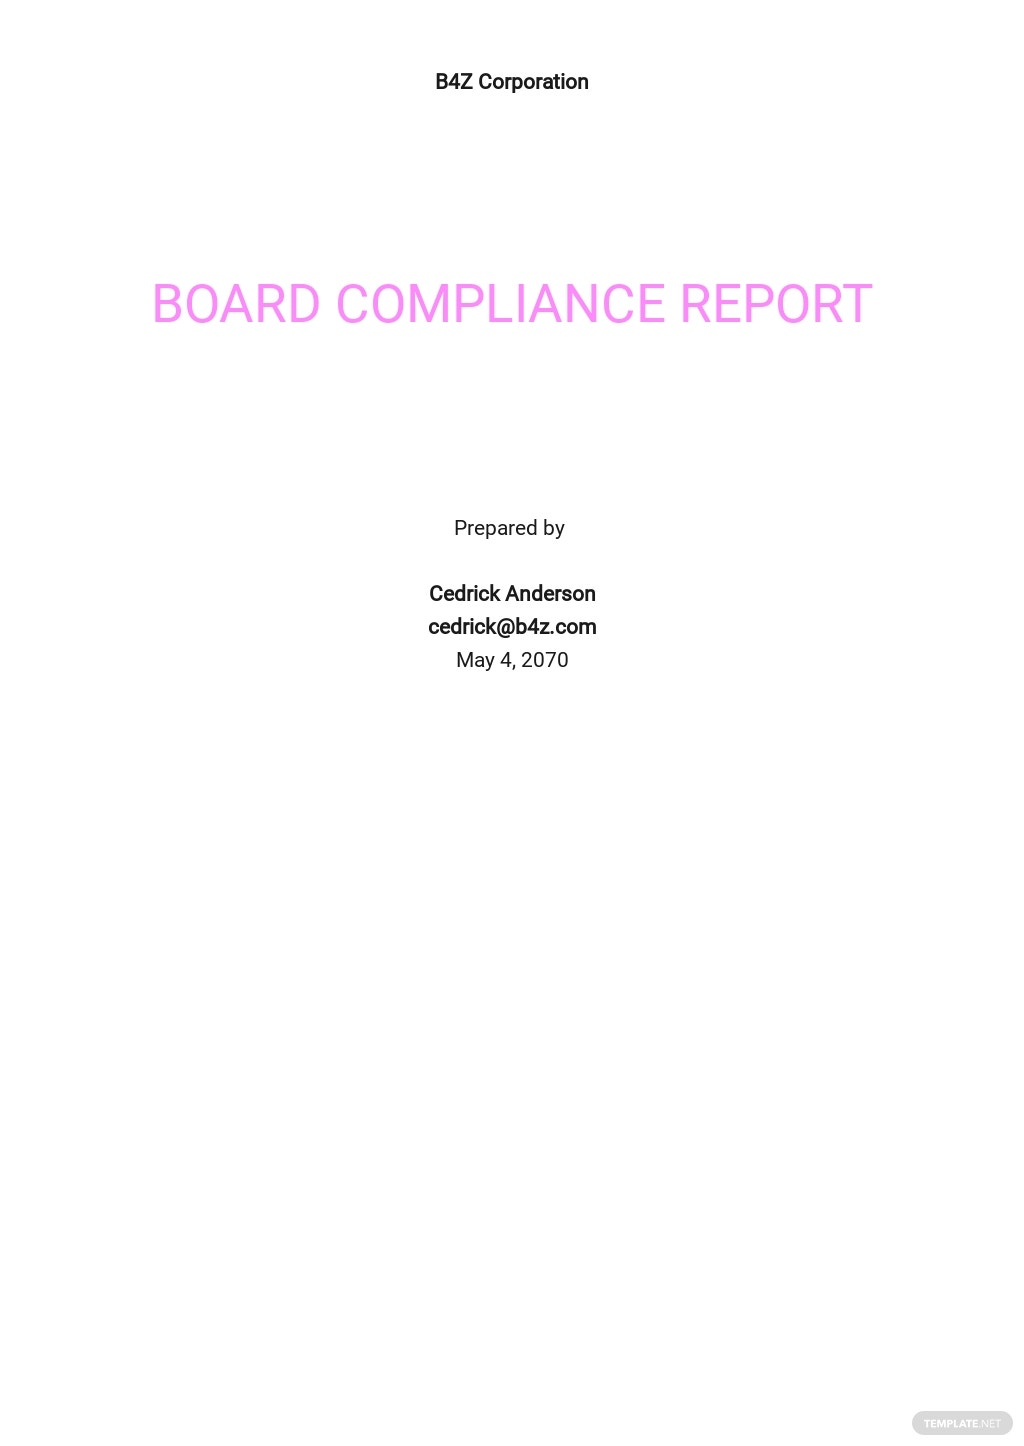 Board Compliance Report Template.jpe